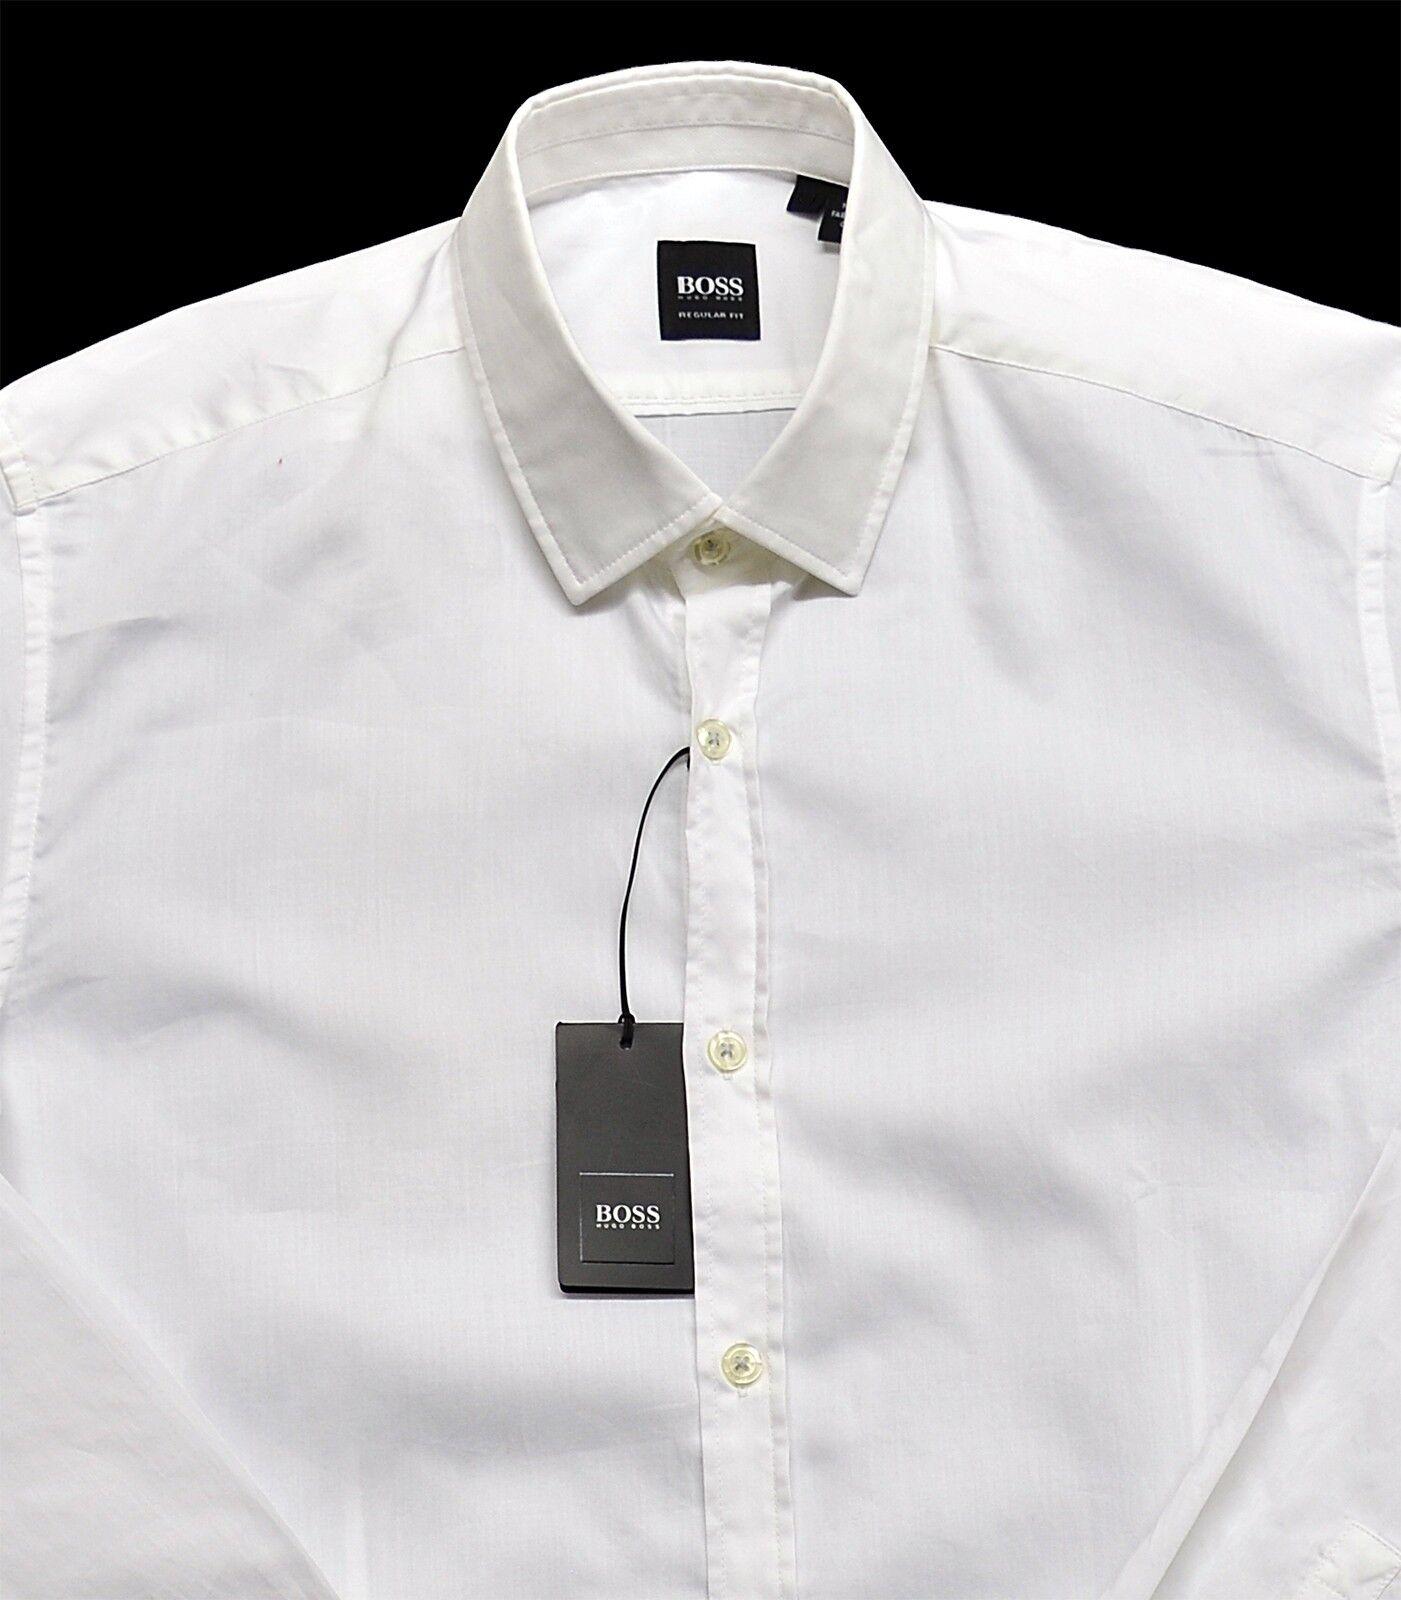 Men's HUGO BOSS White LORENZO Shirt XL XLarge NWT NEW + Regular Fit Nice